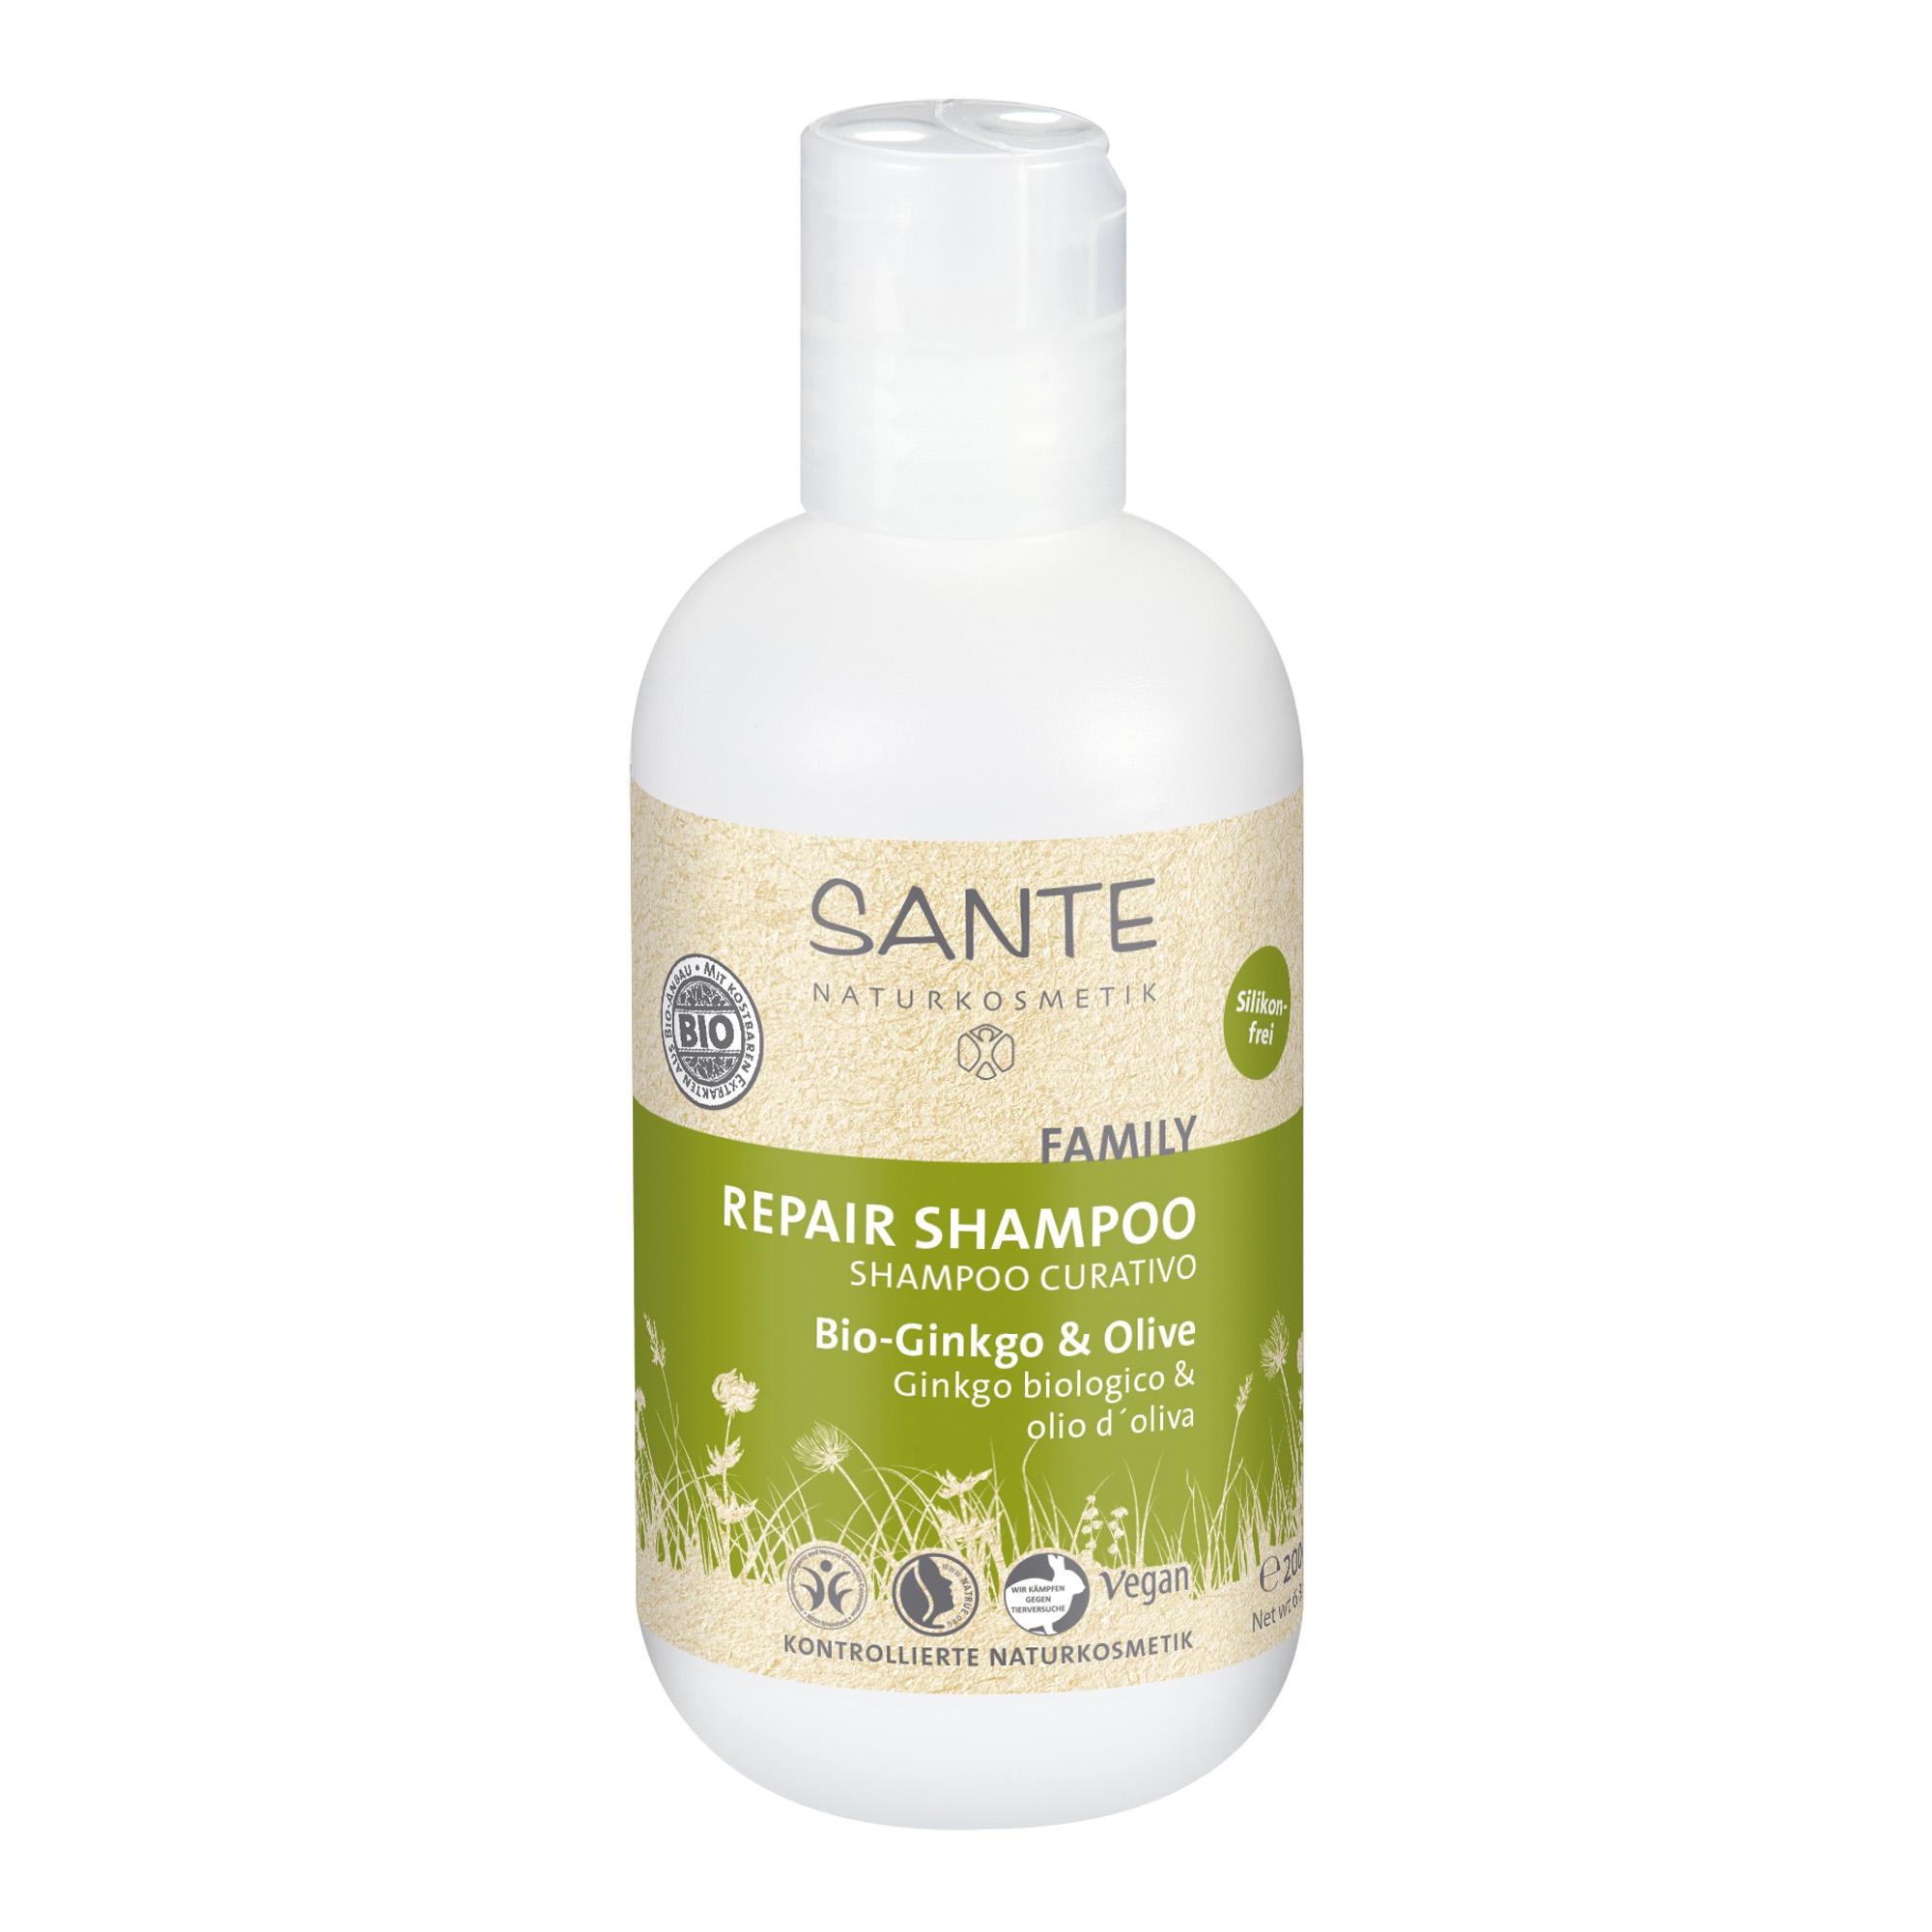 Bio Ginkgo & oliivi hooldav šampoon Sante, 200 ml